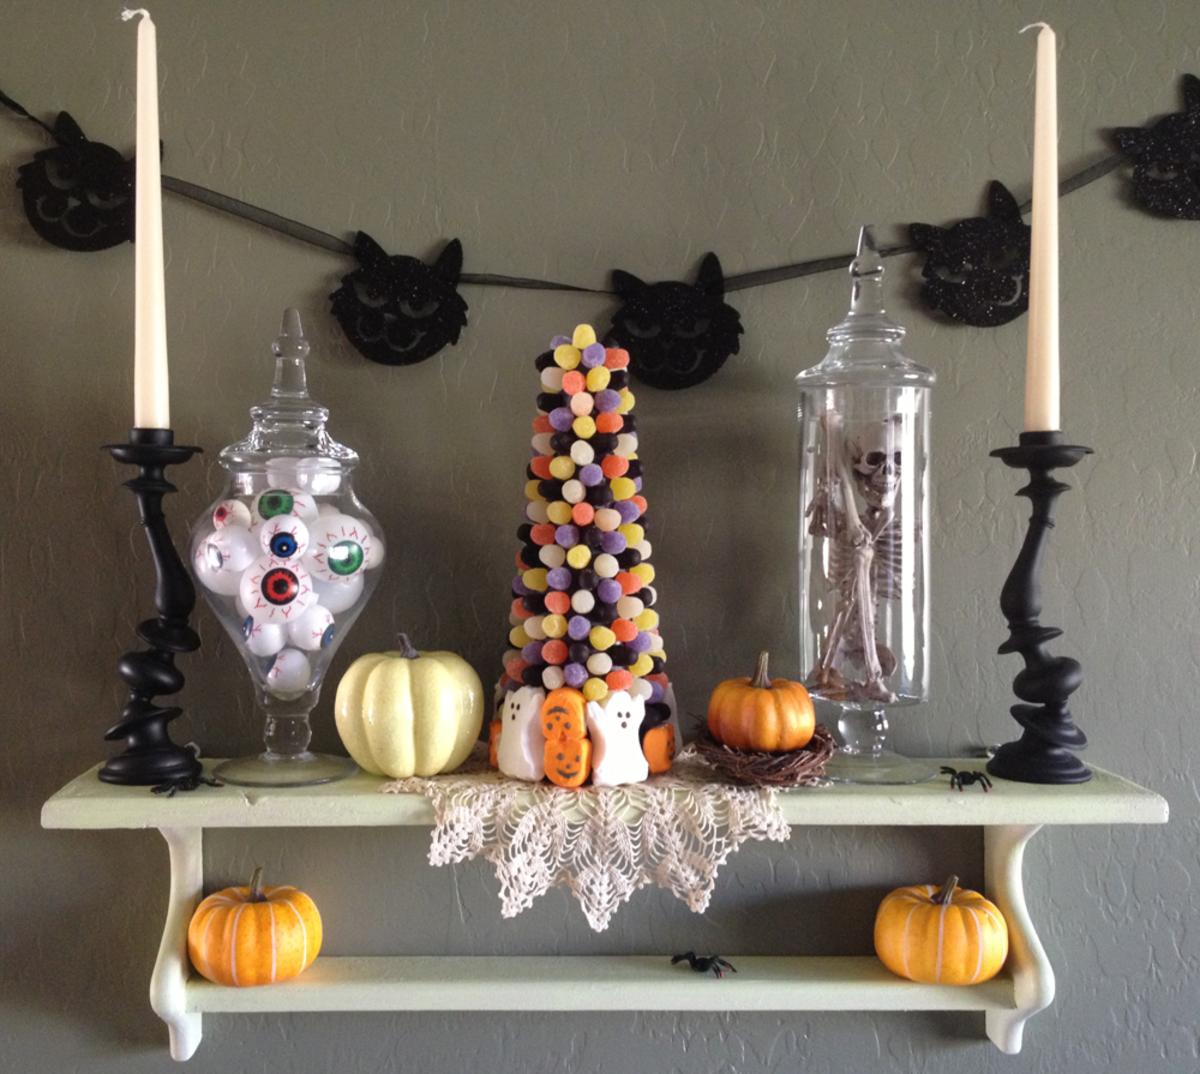 Last Minute Halloween Décor - Ideas for Simple Halloween Decorations